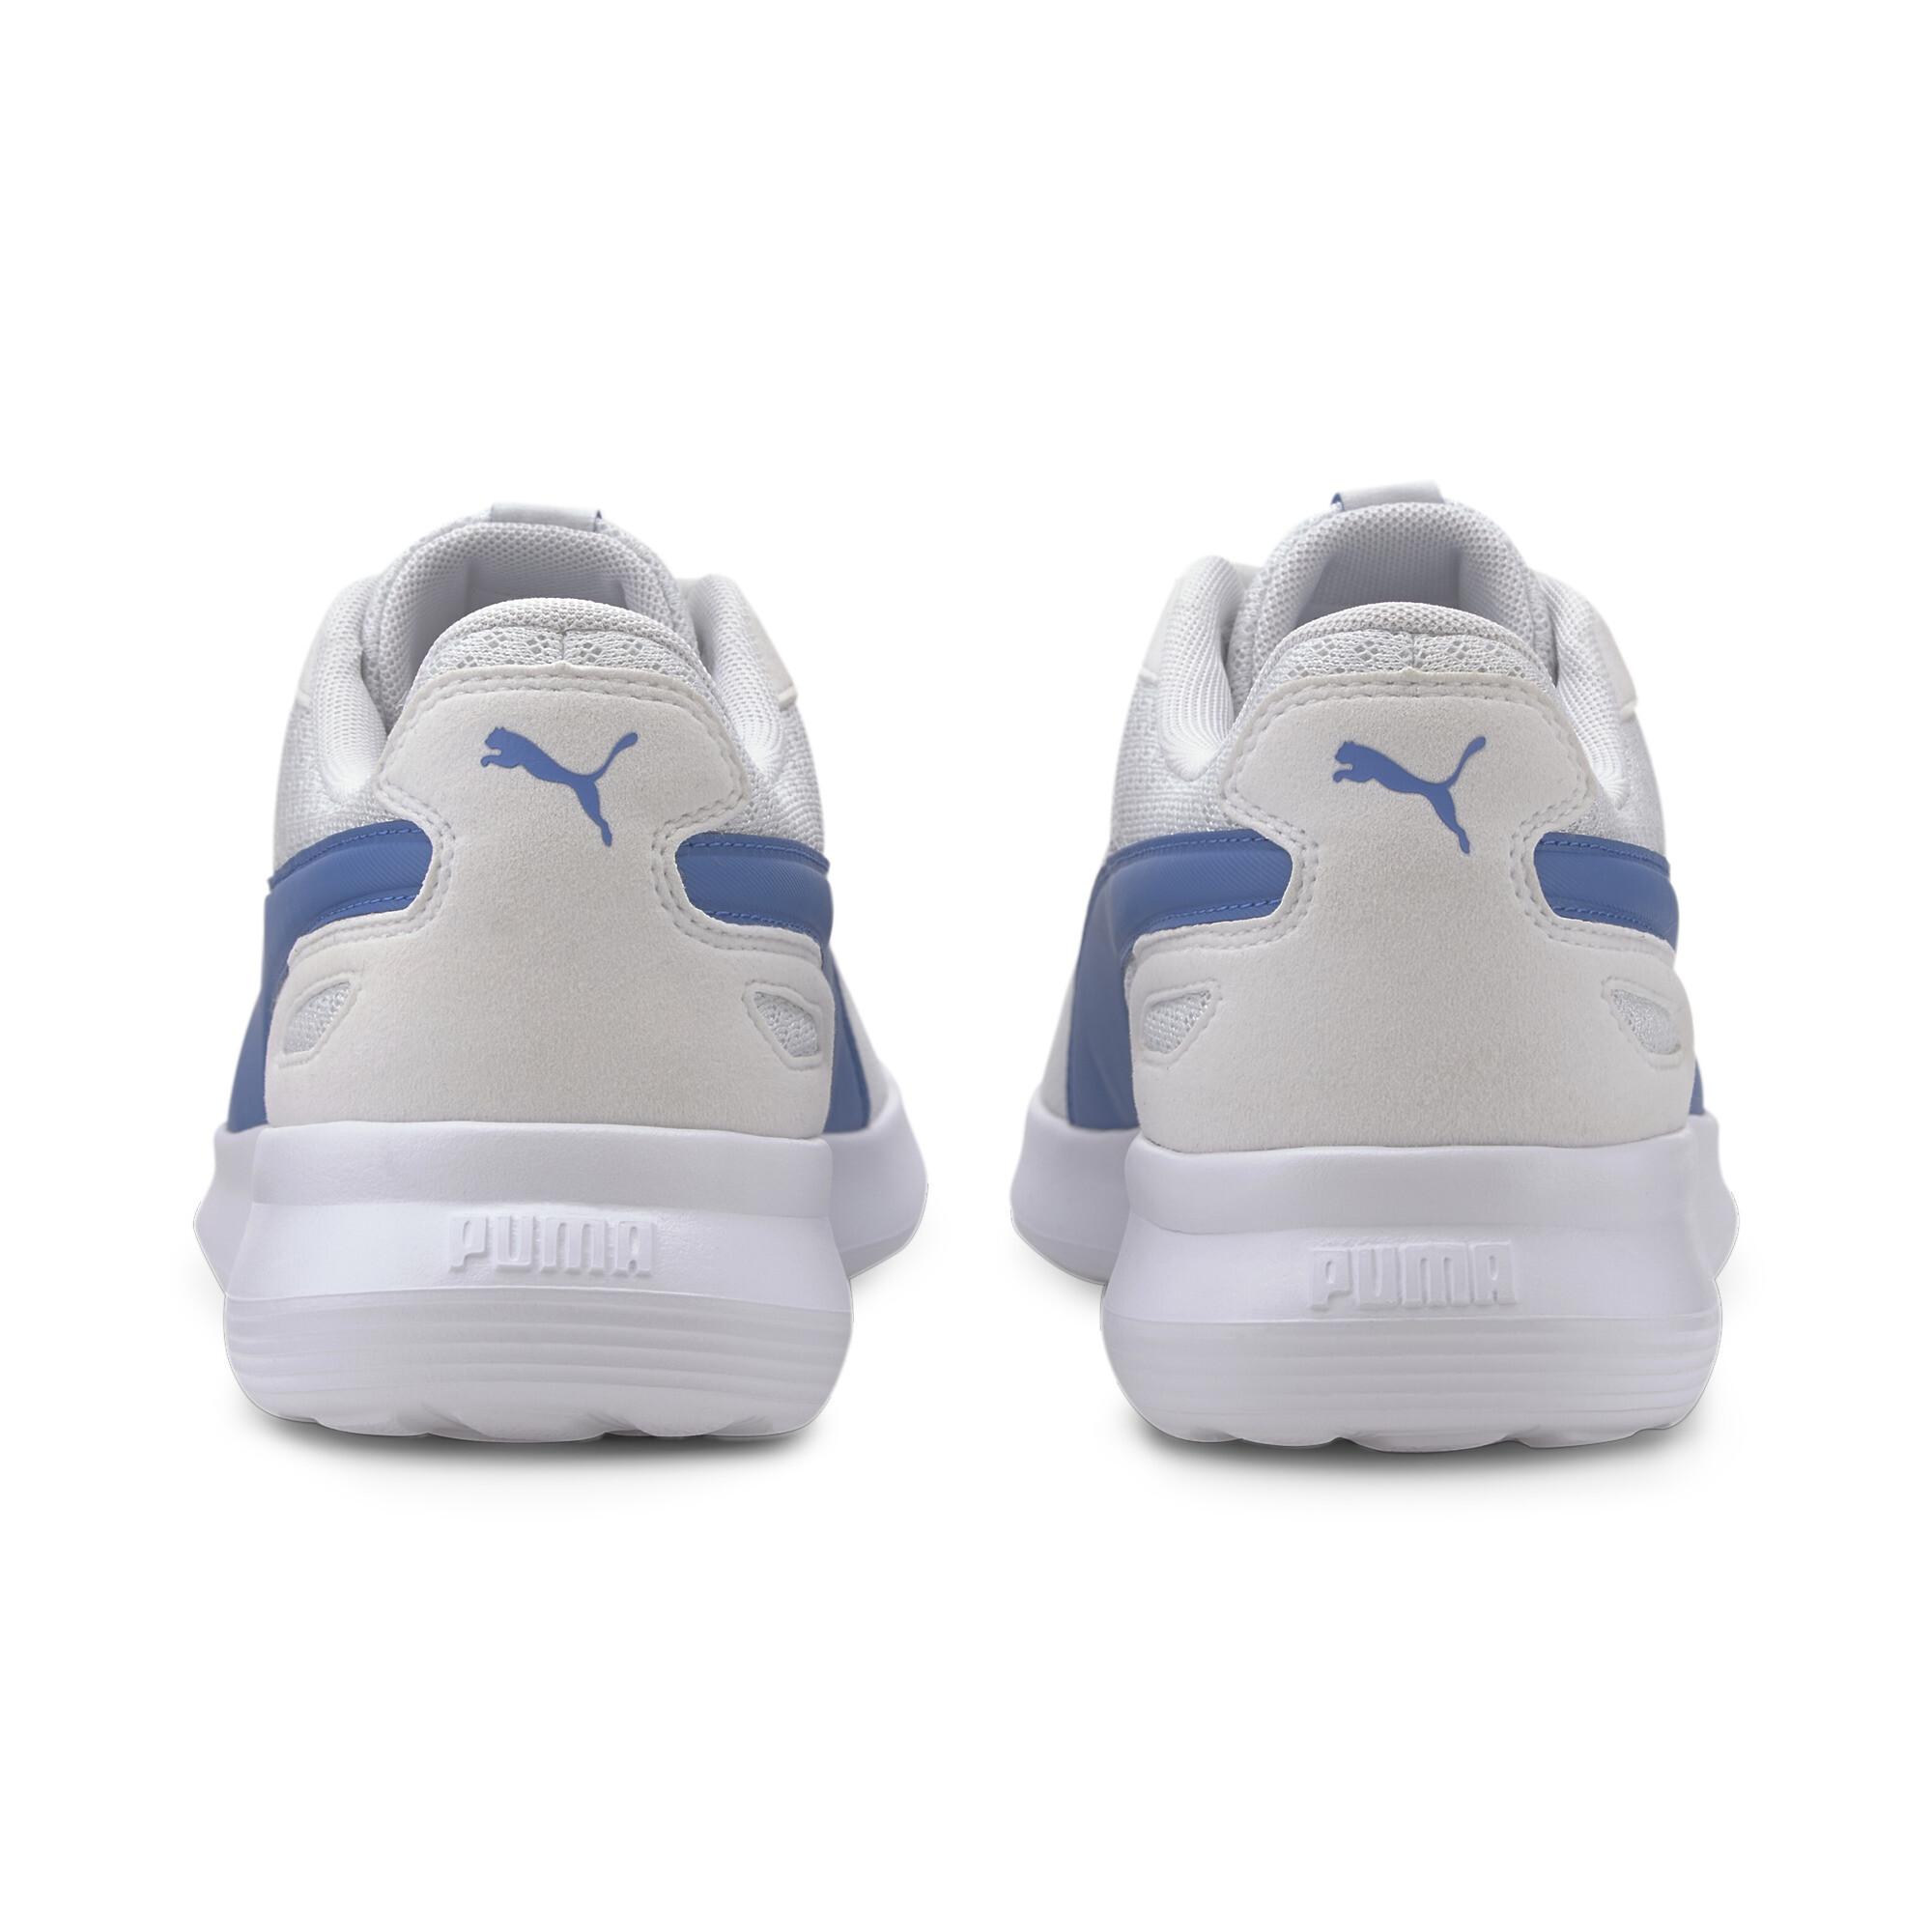 PUMA-Men-039-s-ST-Activate-Sneakers thumbnail 25